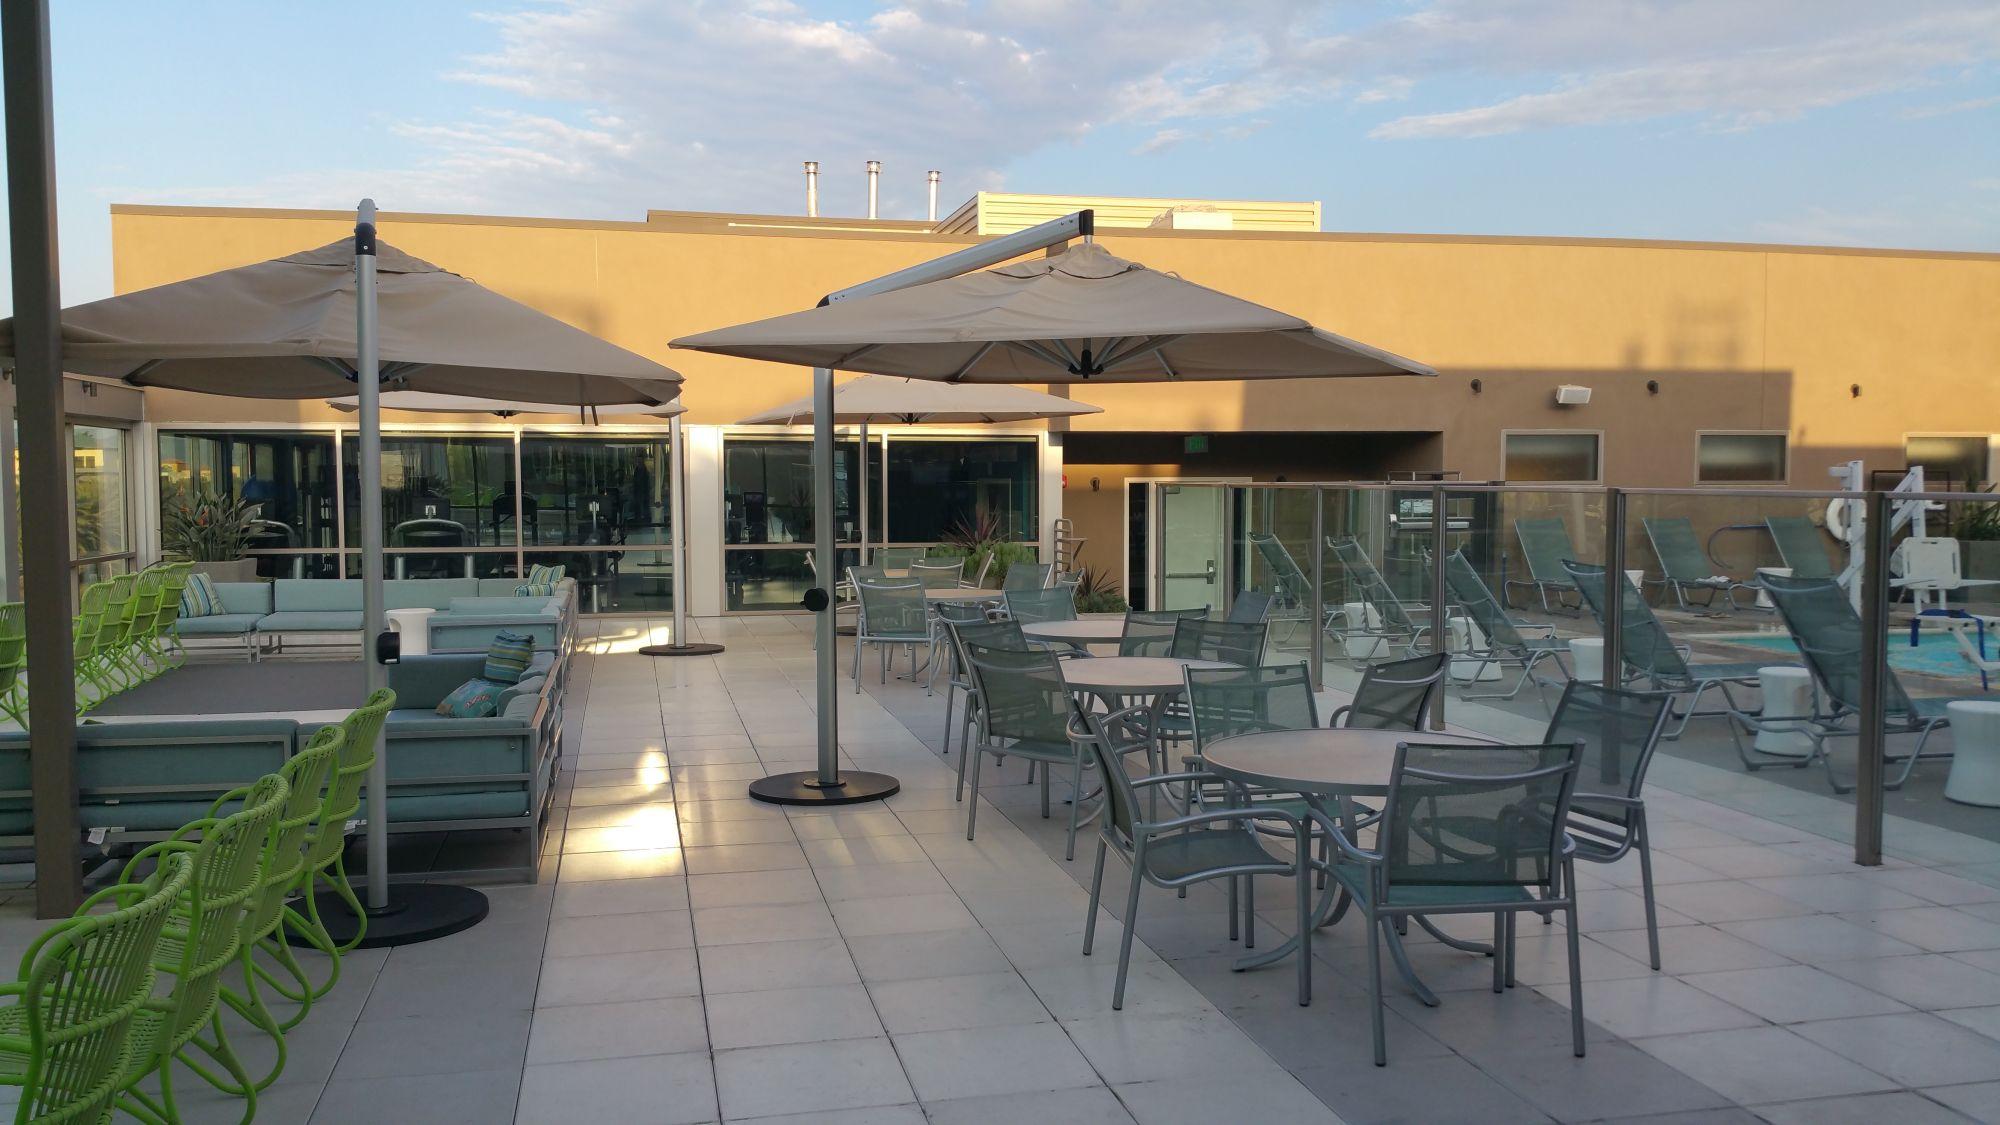 100 anaheim patio your guide to anaheim u0027s breweries